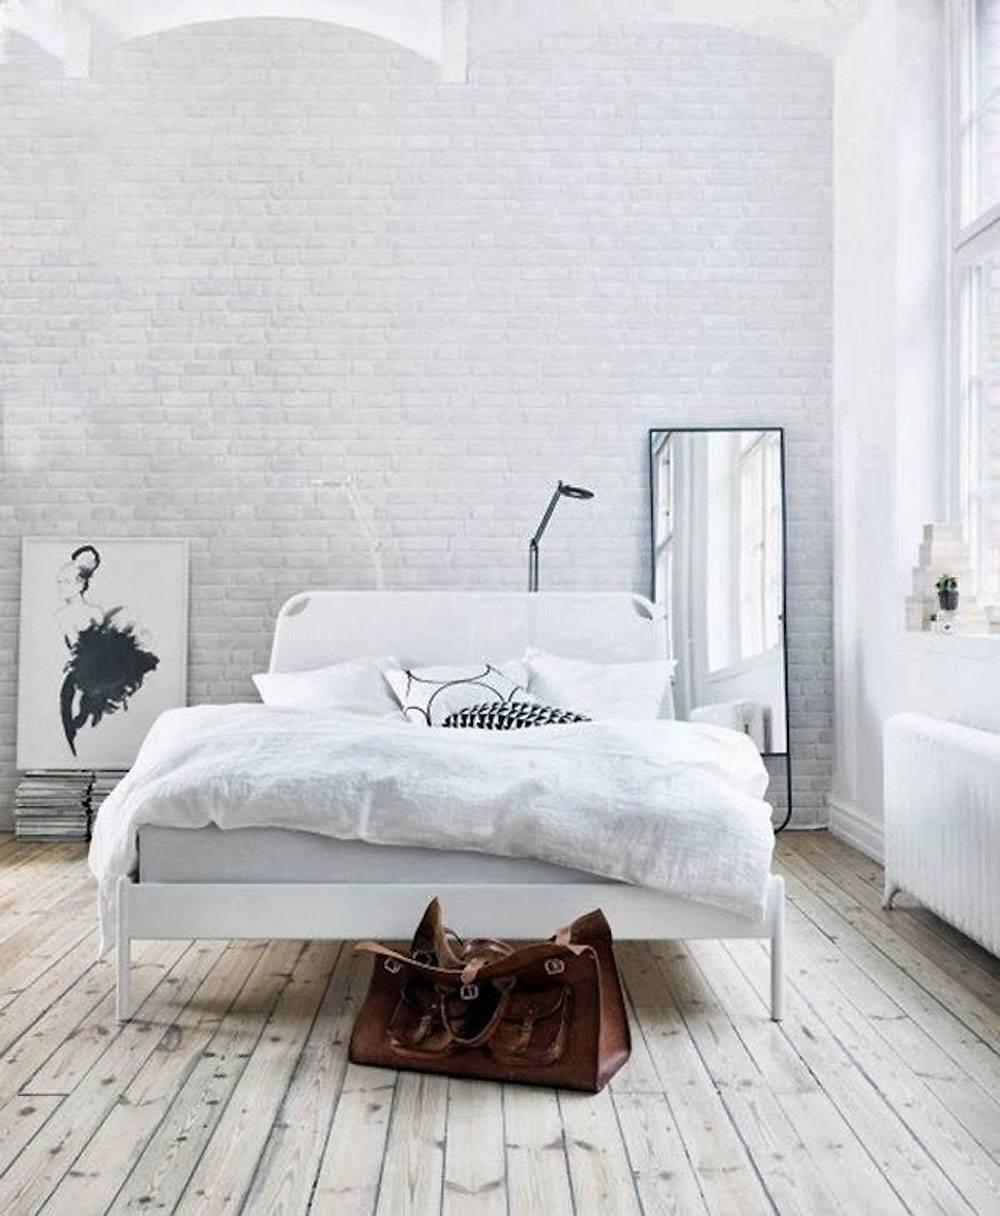 40 Minimalist Bedroom Ideas | Less is More | Homelovr on Bedroom Minimalist Ideas  id=12638